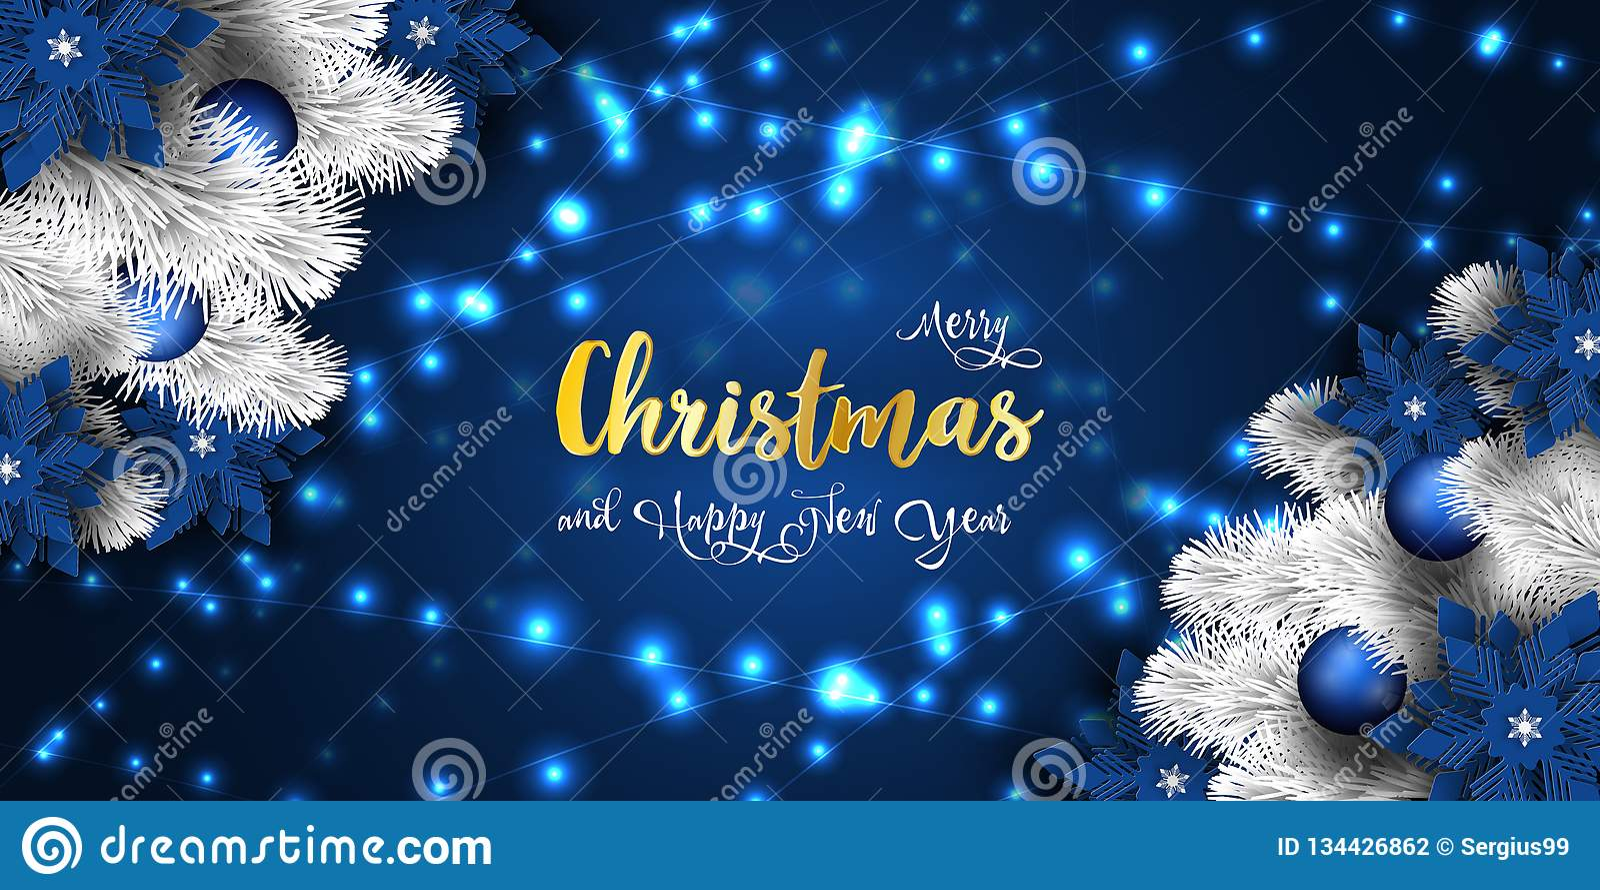 Christmas and New Year 2019 banner, Xmas sparkling magic lights garland